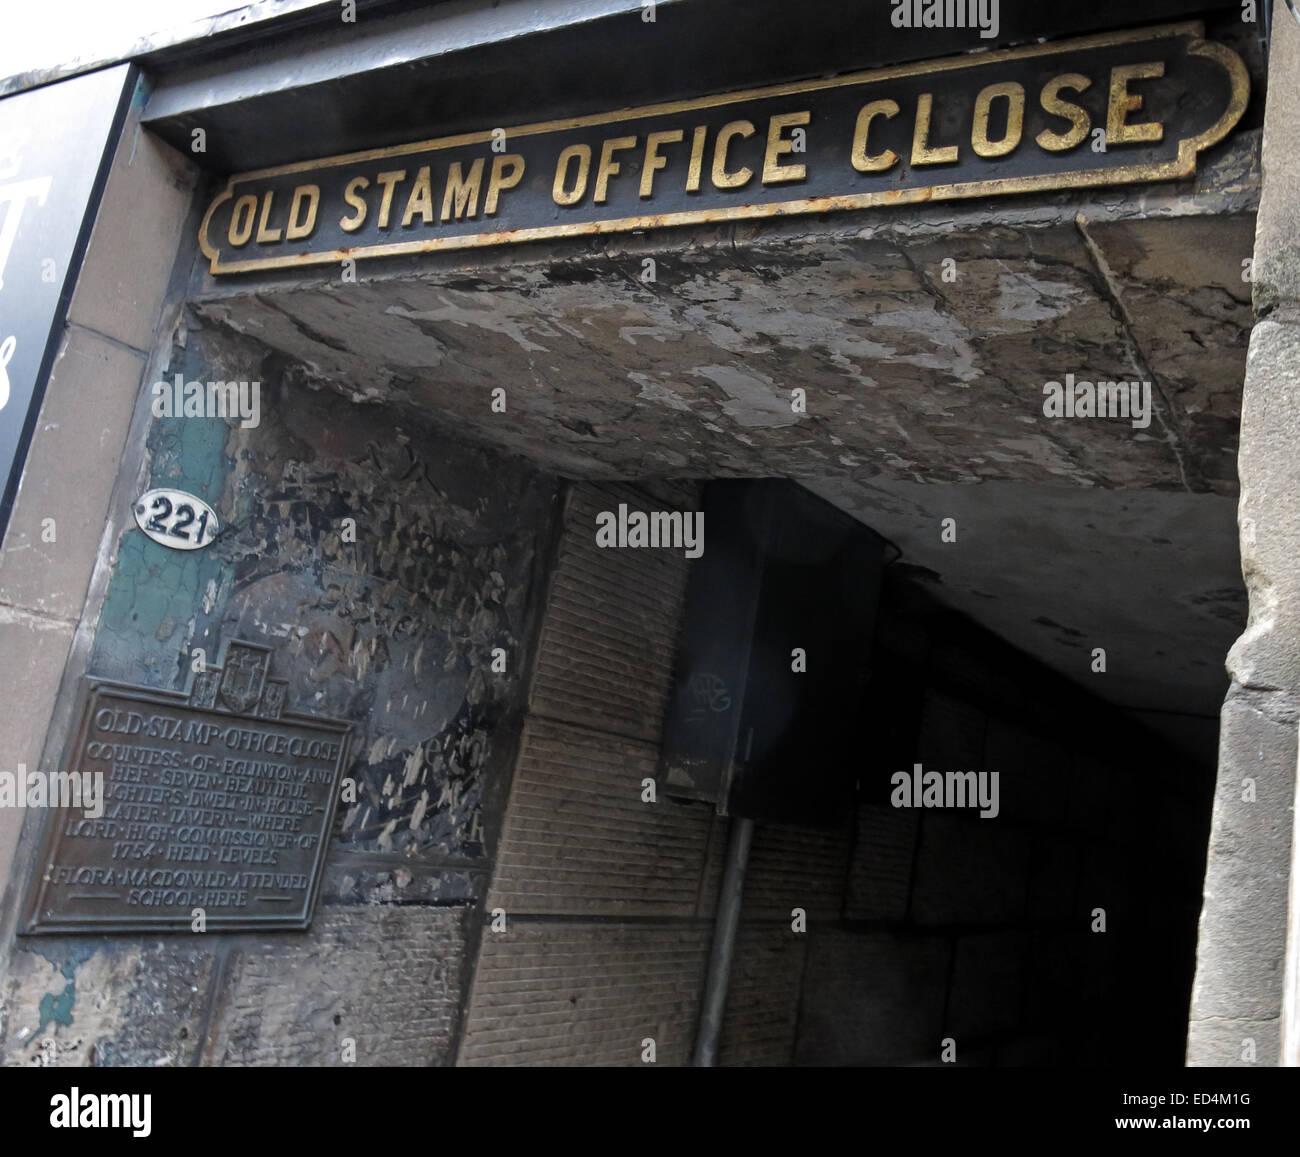 Old Stamp Office Close, off Royal Mile, Edinburgh City, Scotland, UK - Stock Image